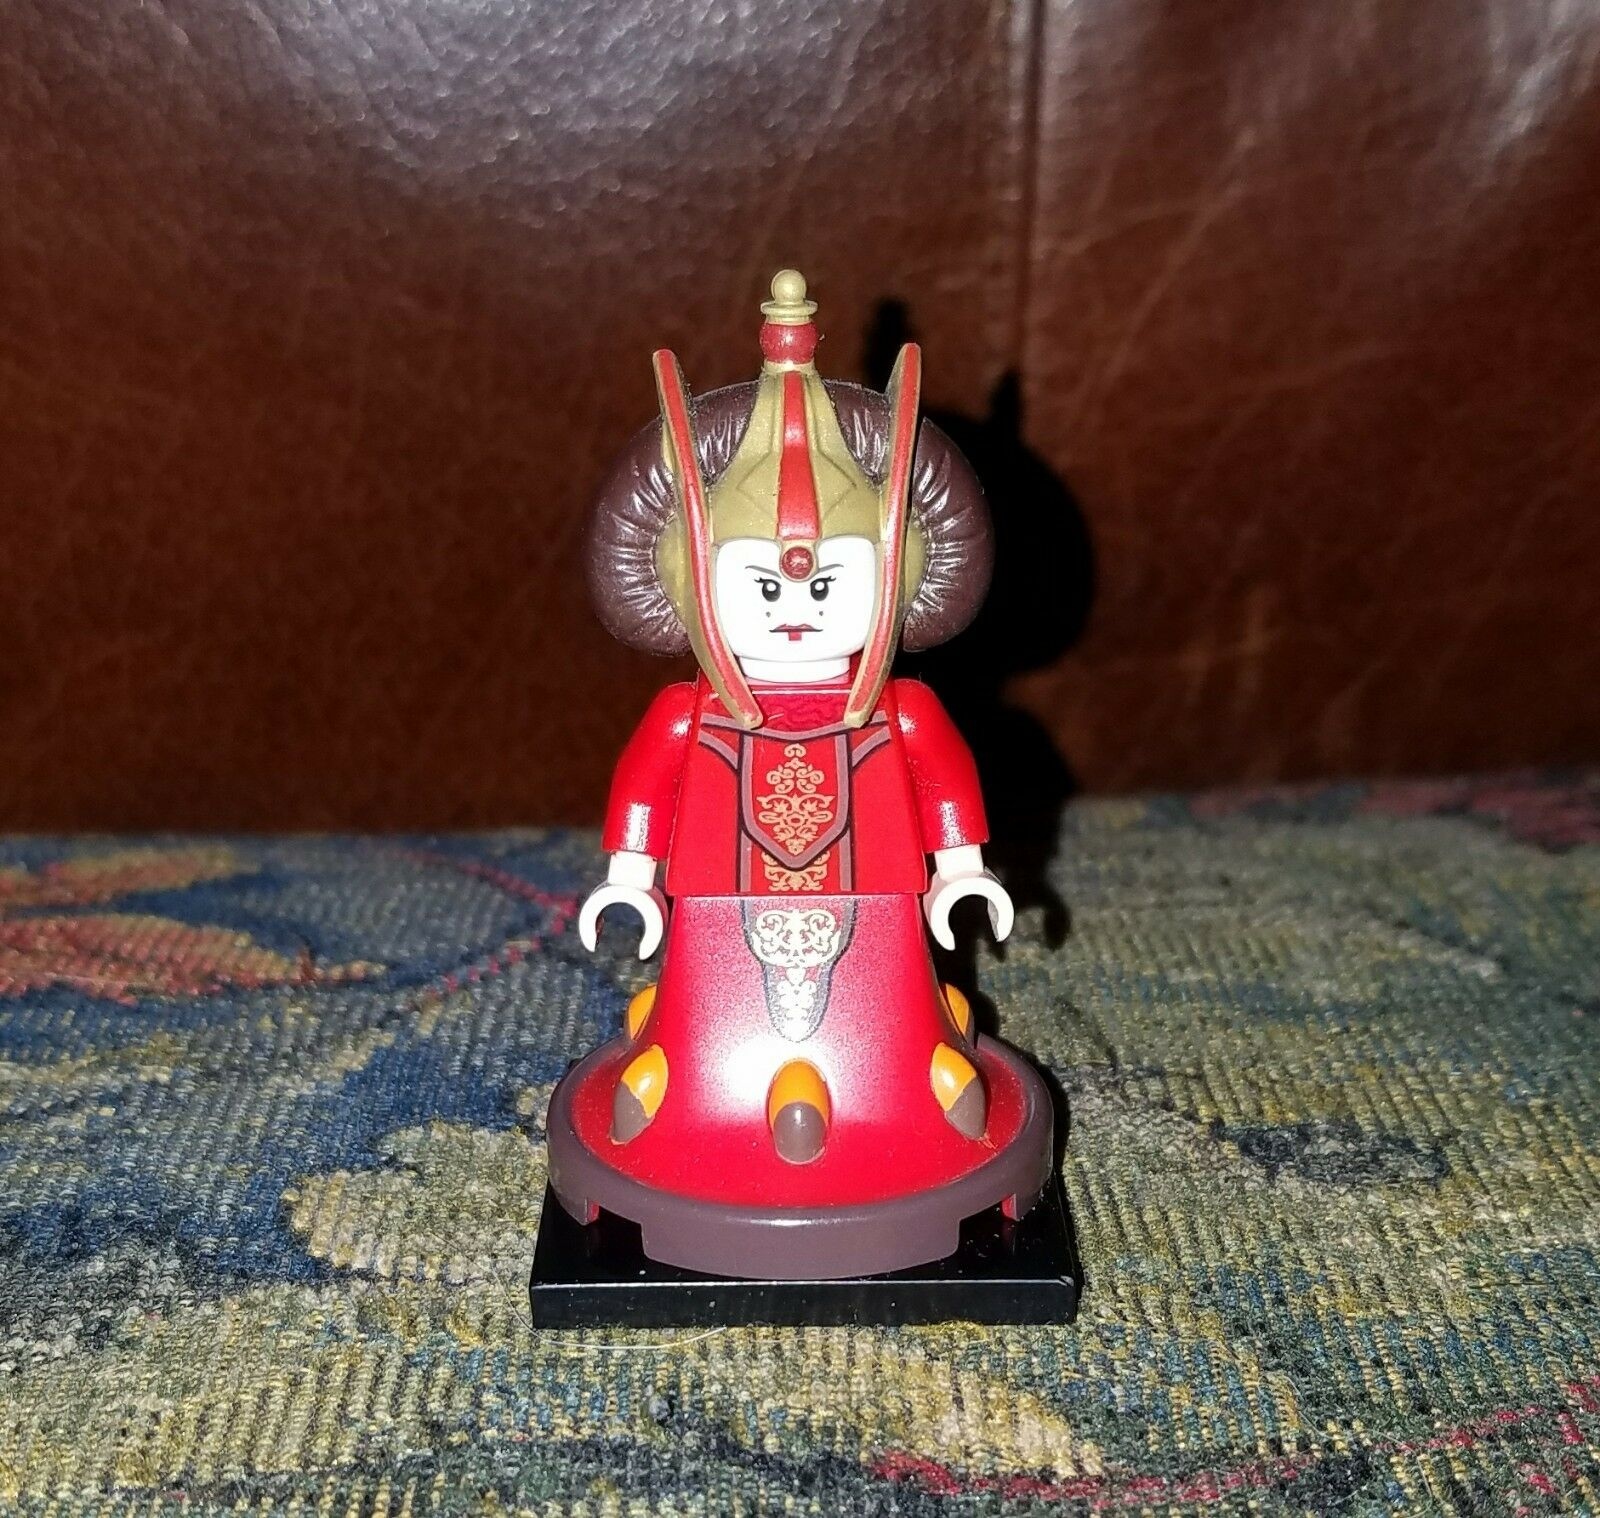 Authentic LEGO Star Wars Queen Amidala Minifig sw387 9499 Padme RepublicSenator